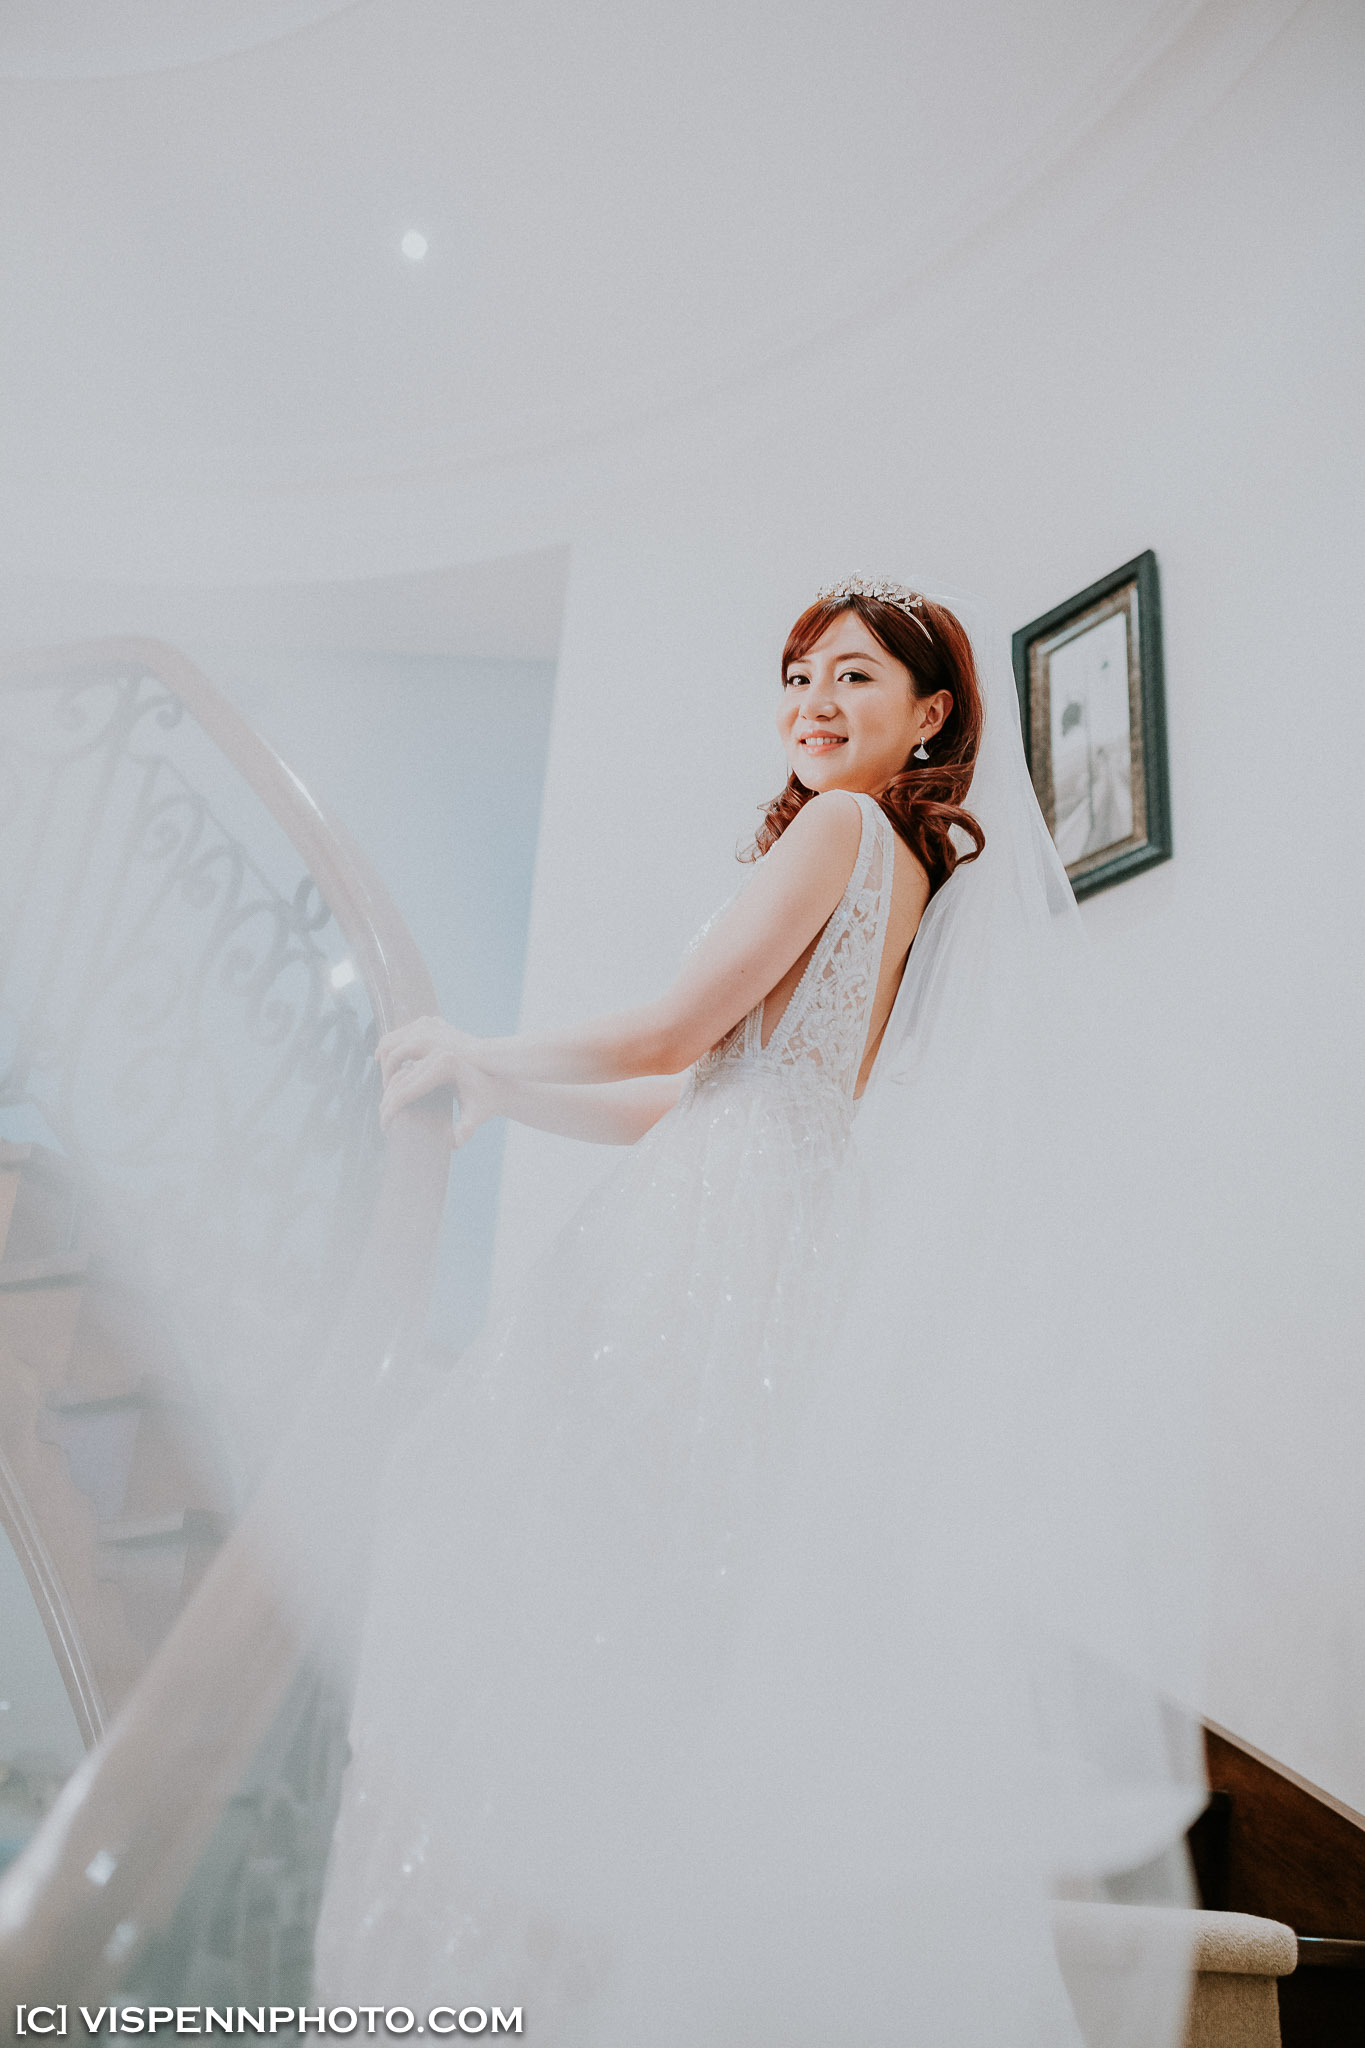 WEDDING DAY Photography Melbourne VISPENN 墨尔本 婚礼跟拍 婚礼摄像 婚礼摄影 结婚照 登记照 VISPENN 0057 1R9A4452